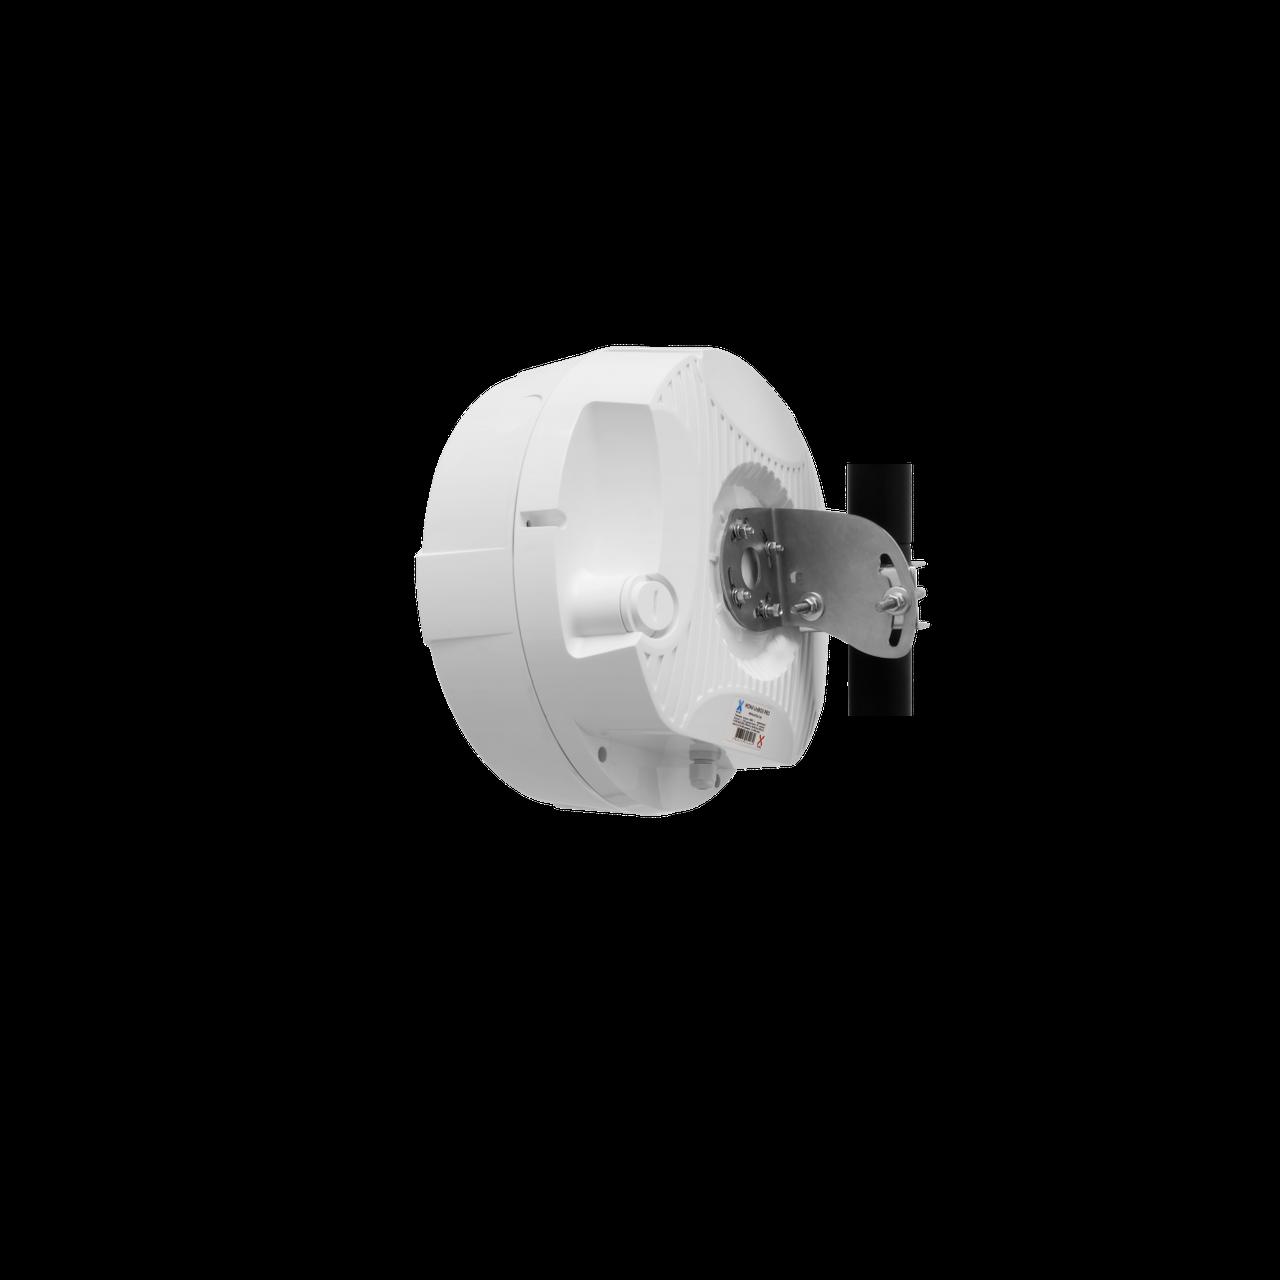 Широкополосная направленная антенна MONA UNIBOX PRO, 790÷960/1700÷2700 МГц. КУ=9÷15dBi + Бокс+ Uf.l(I P